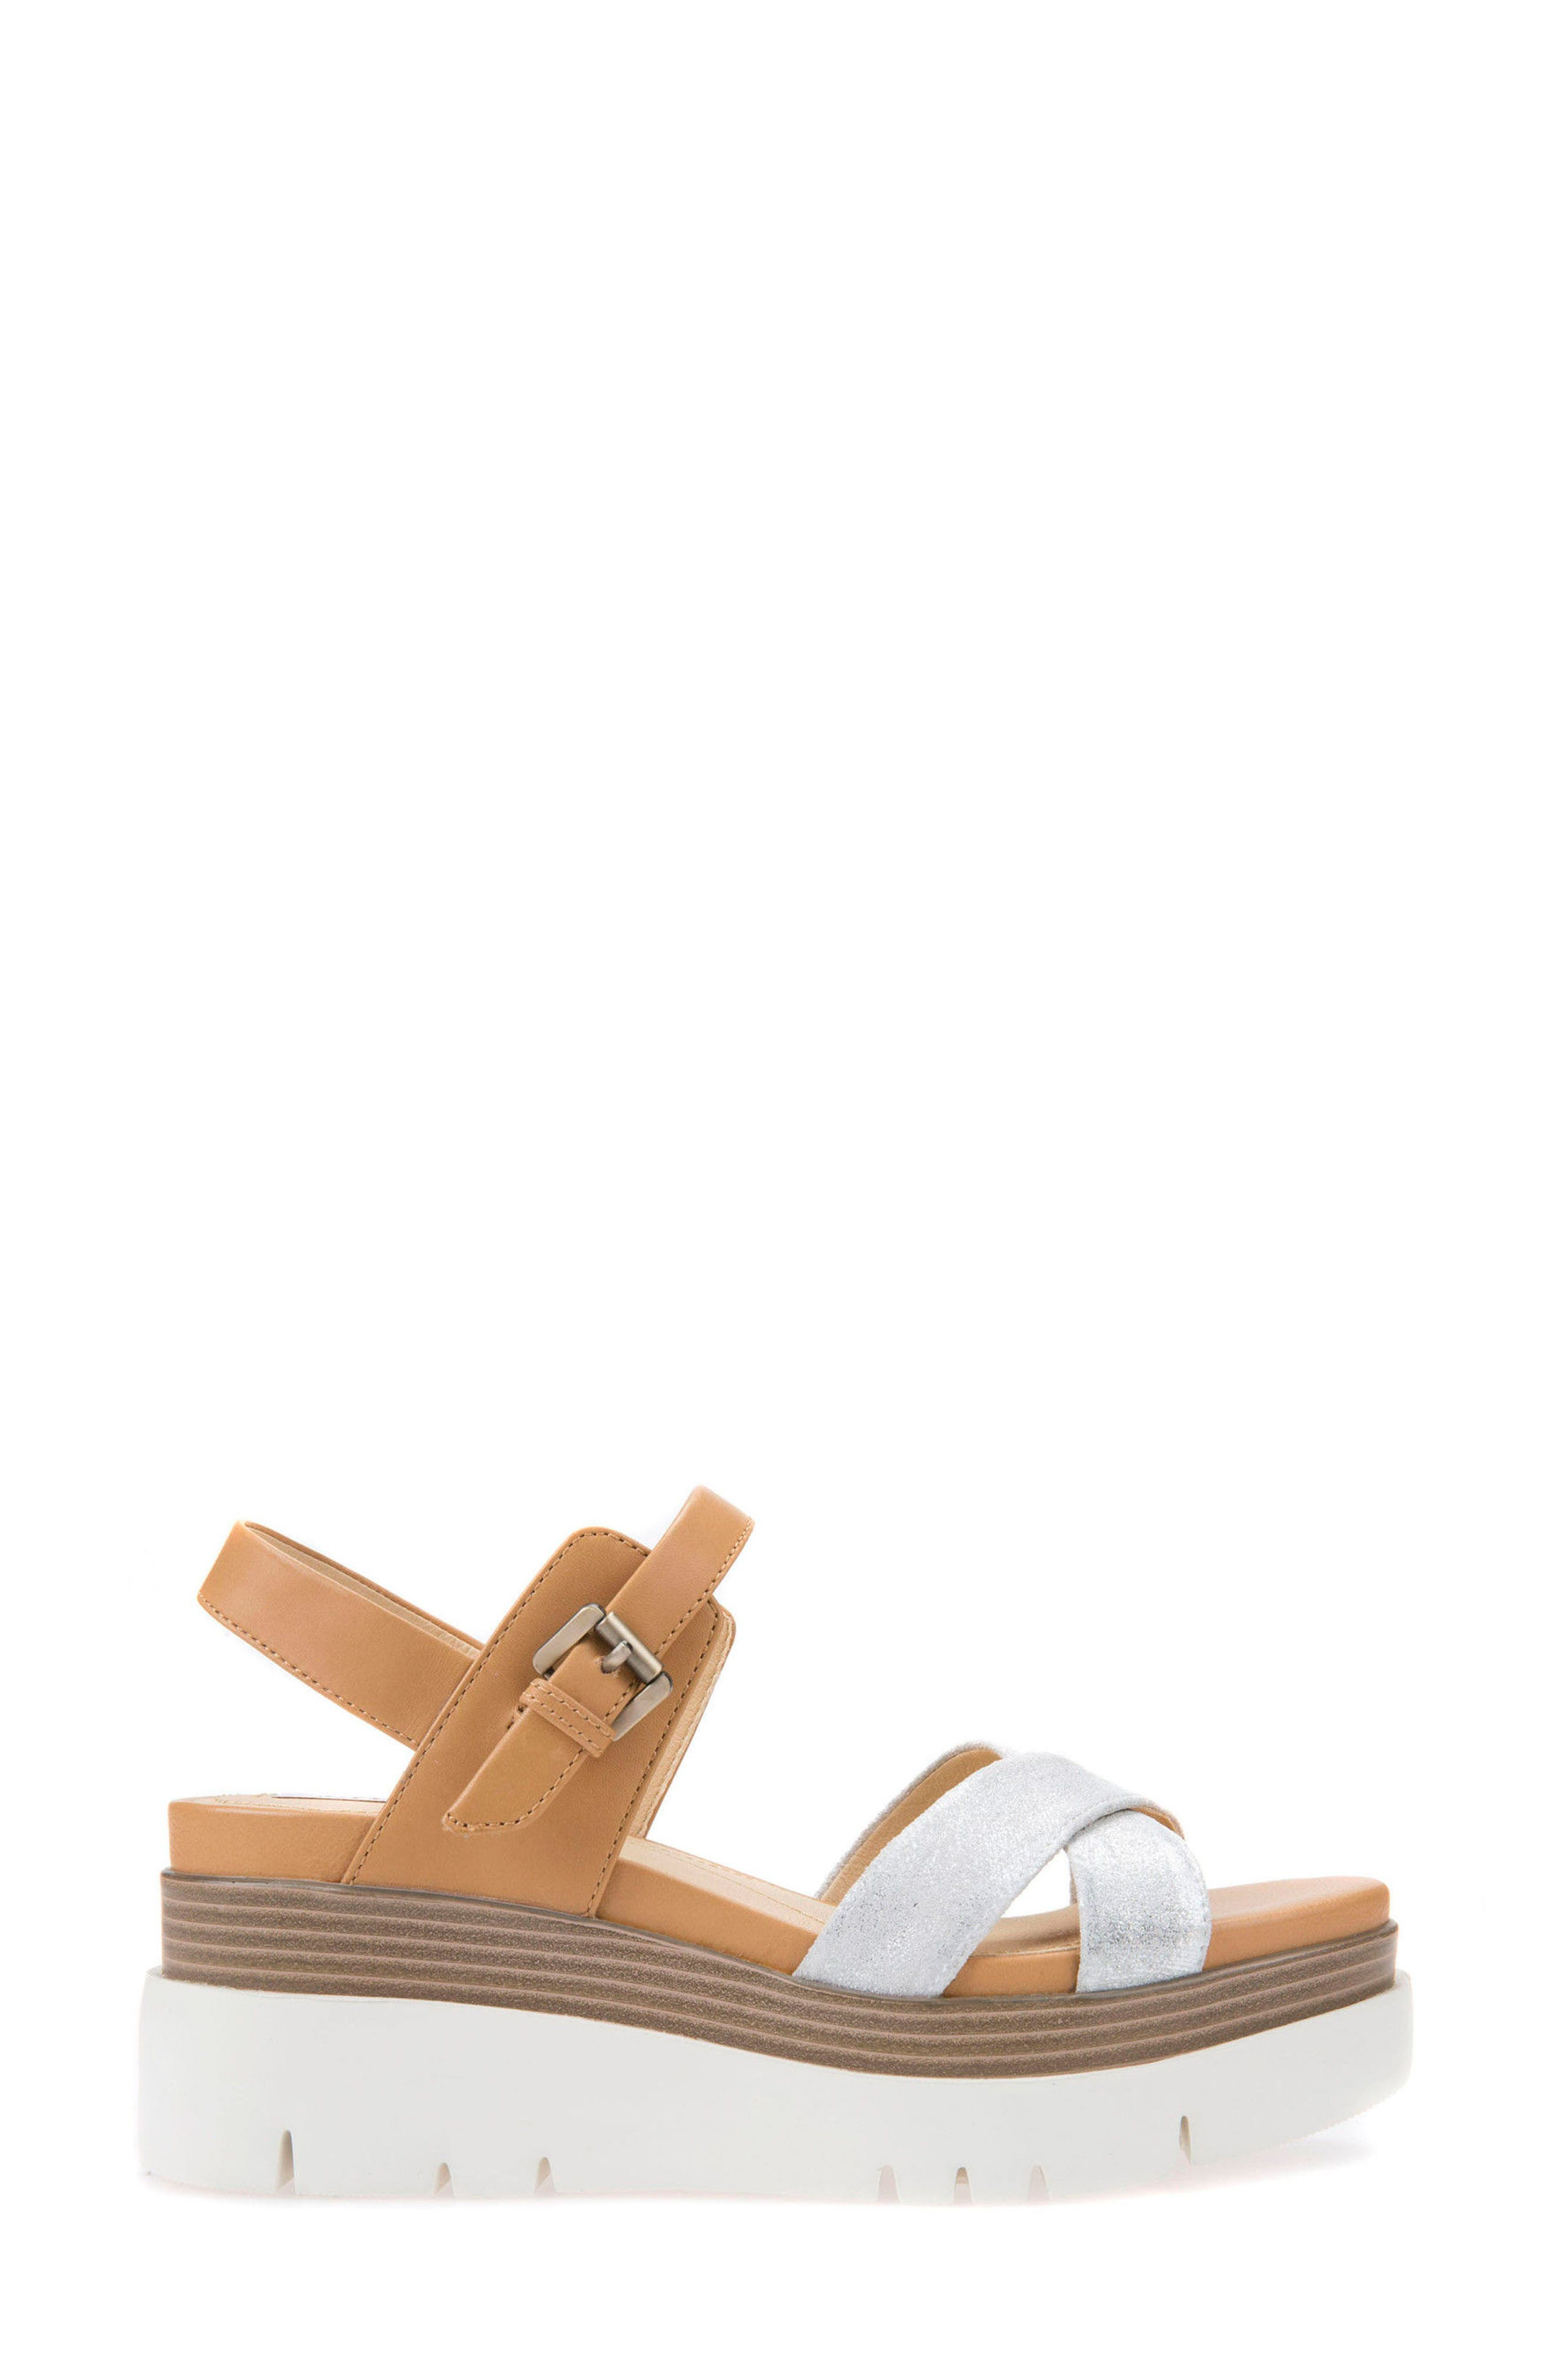 Radwa Platform Sandal,                             Alternate thumbnail 3, color,                             Off White Leather